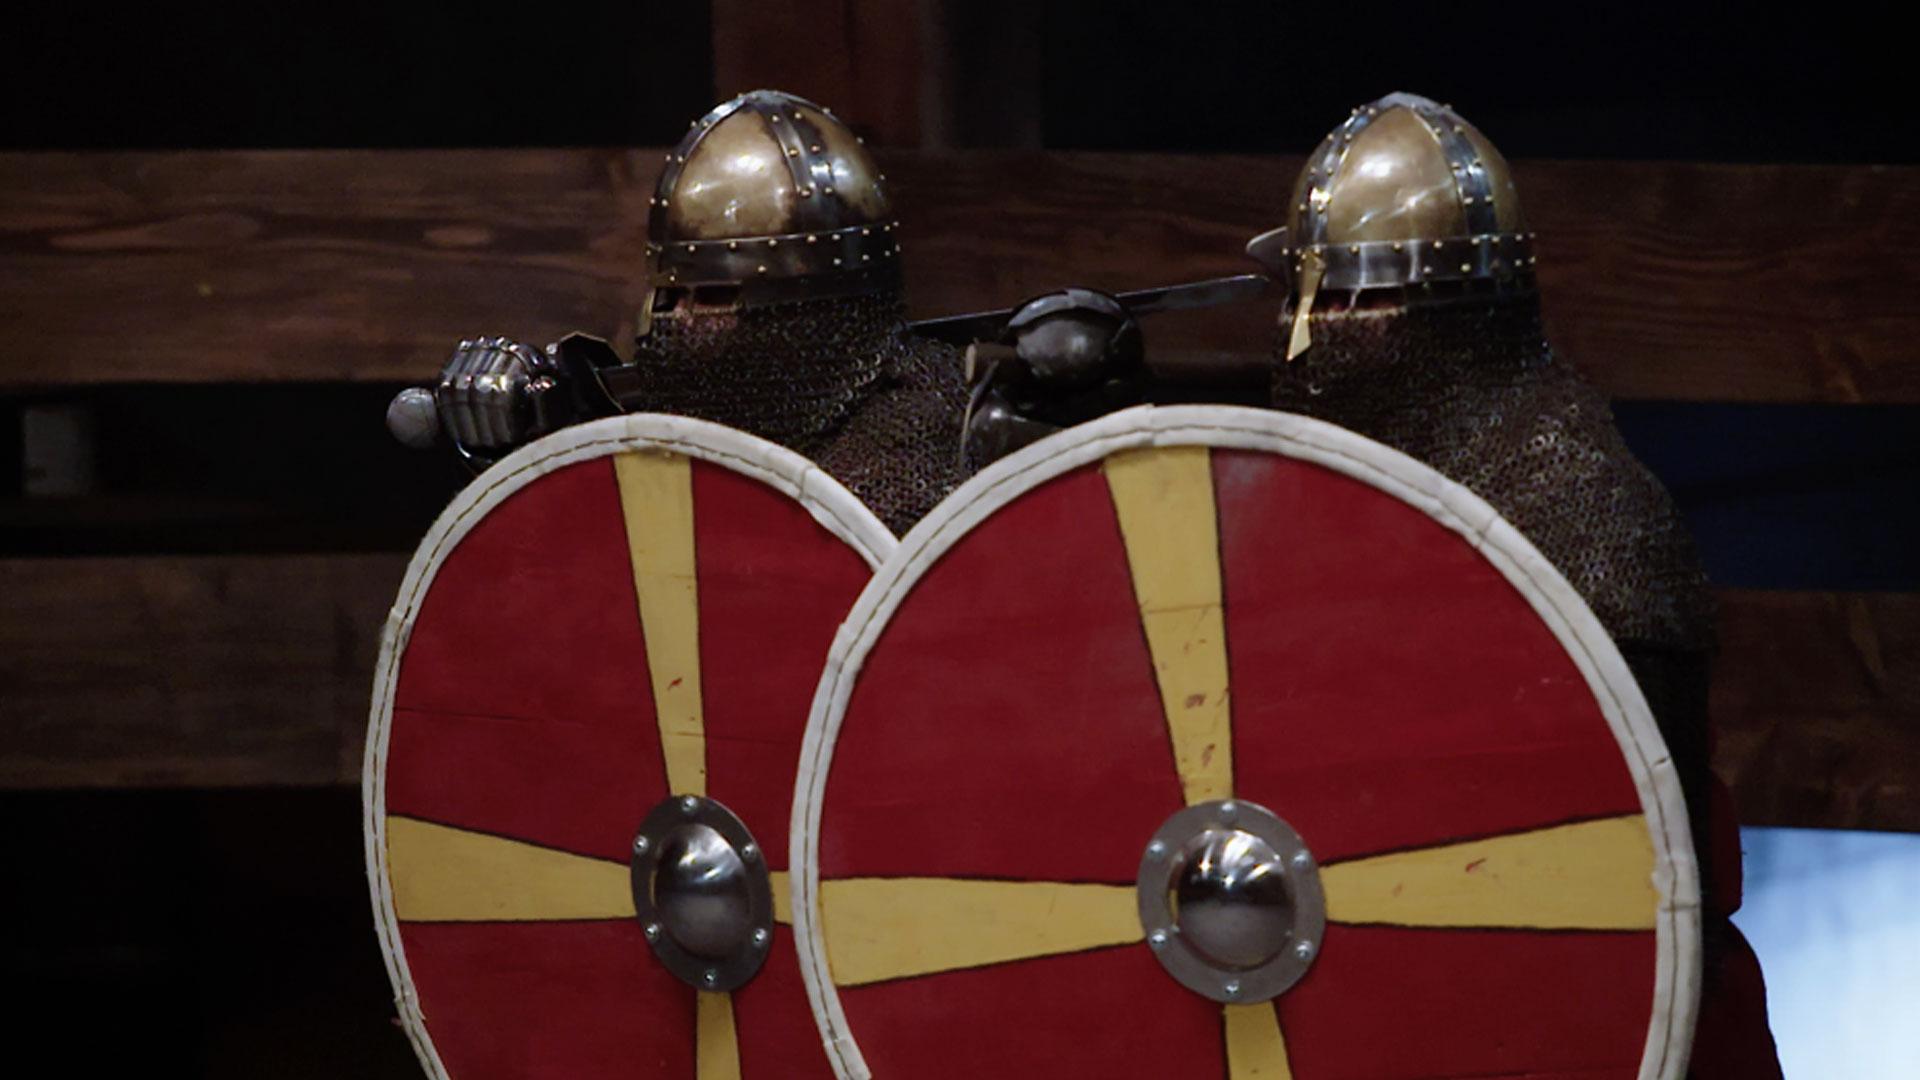 Normans vs Saxons